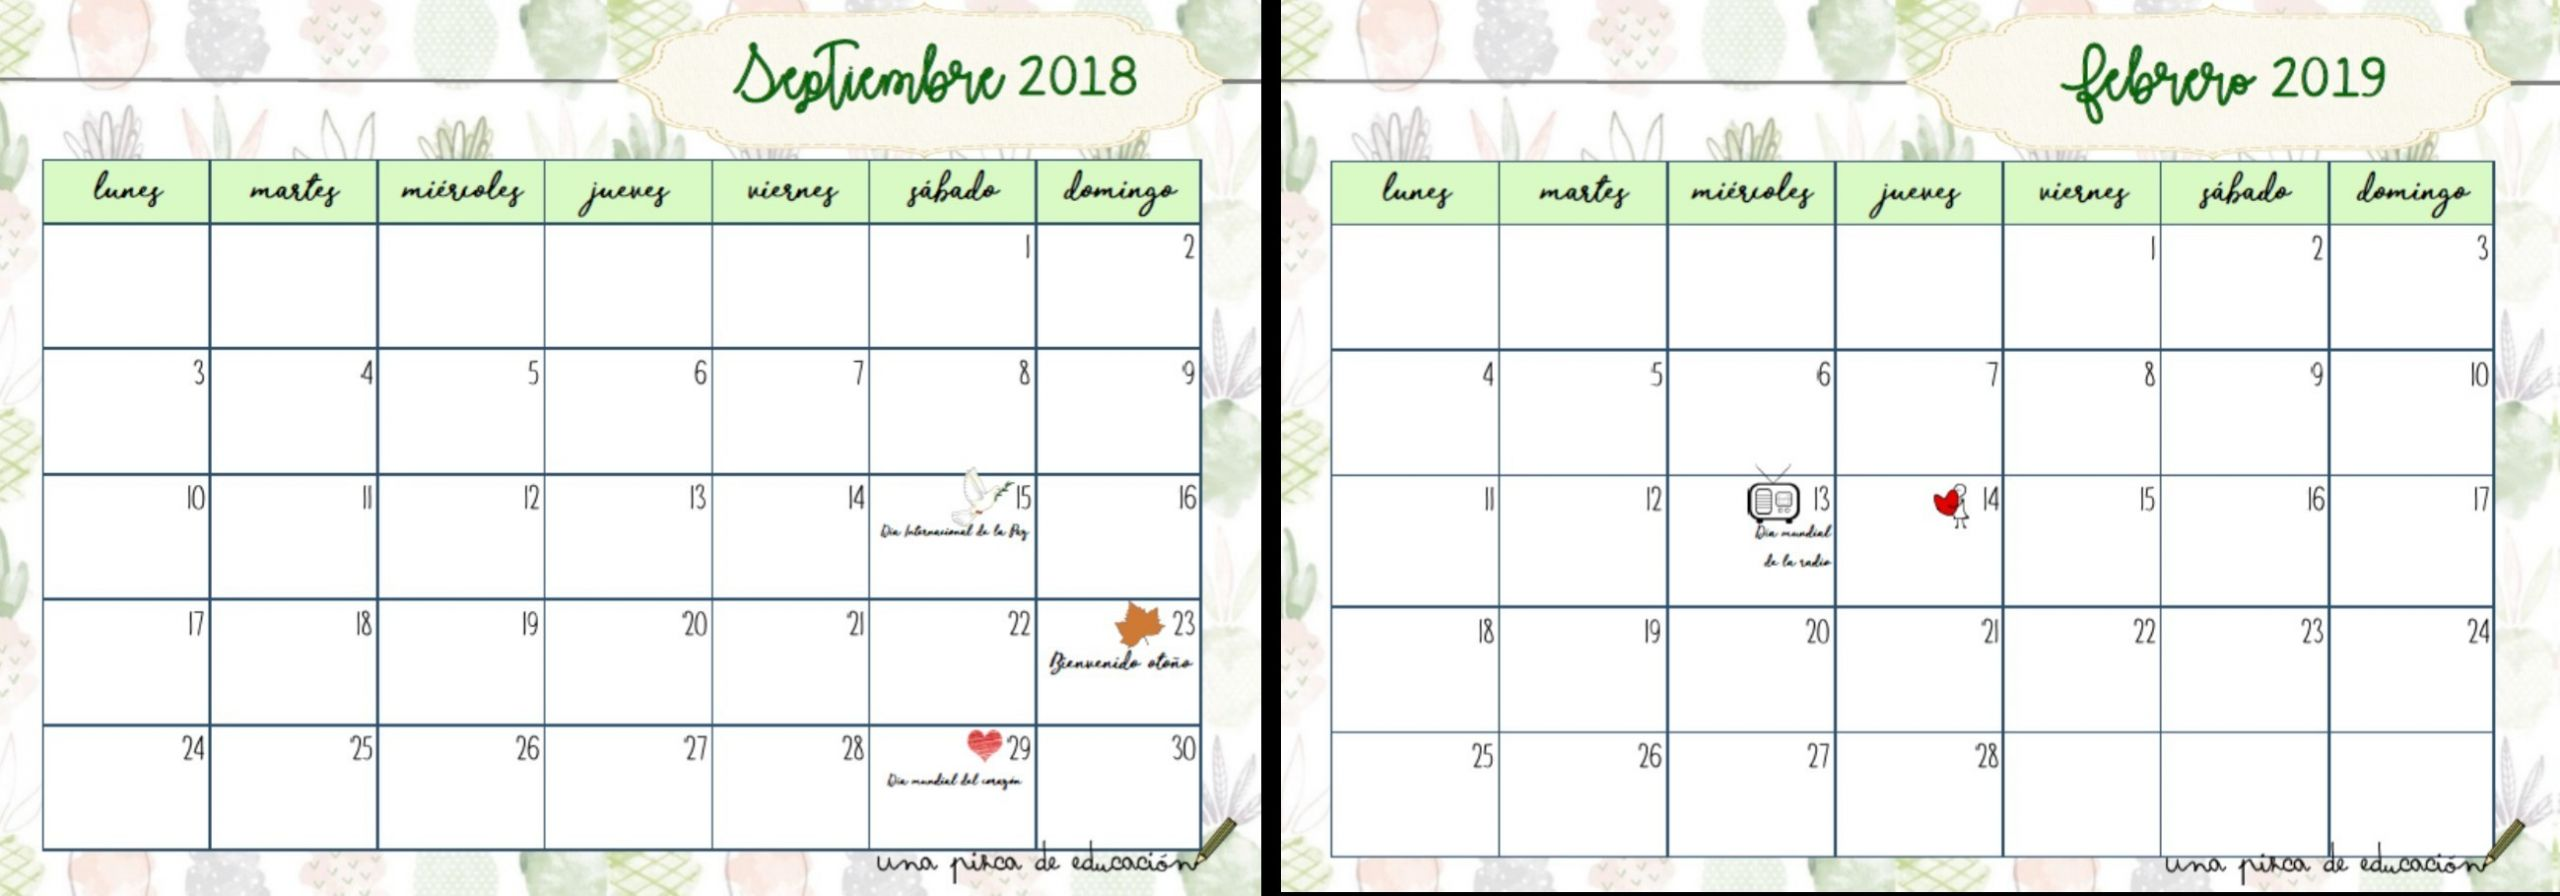 calendario octubre 2017 para imprimir chile mas reciente noticias calendario 2017 para imprimir michelzbinden of calendario octubre 2017 para imprimir chile